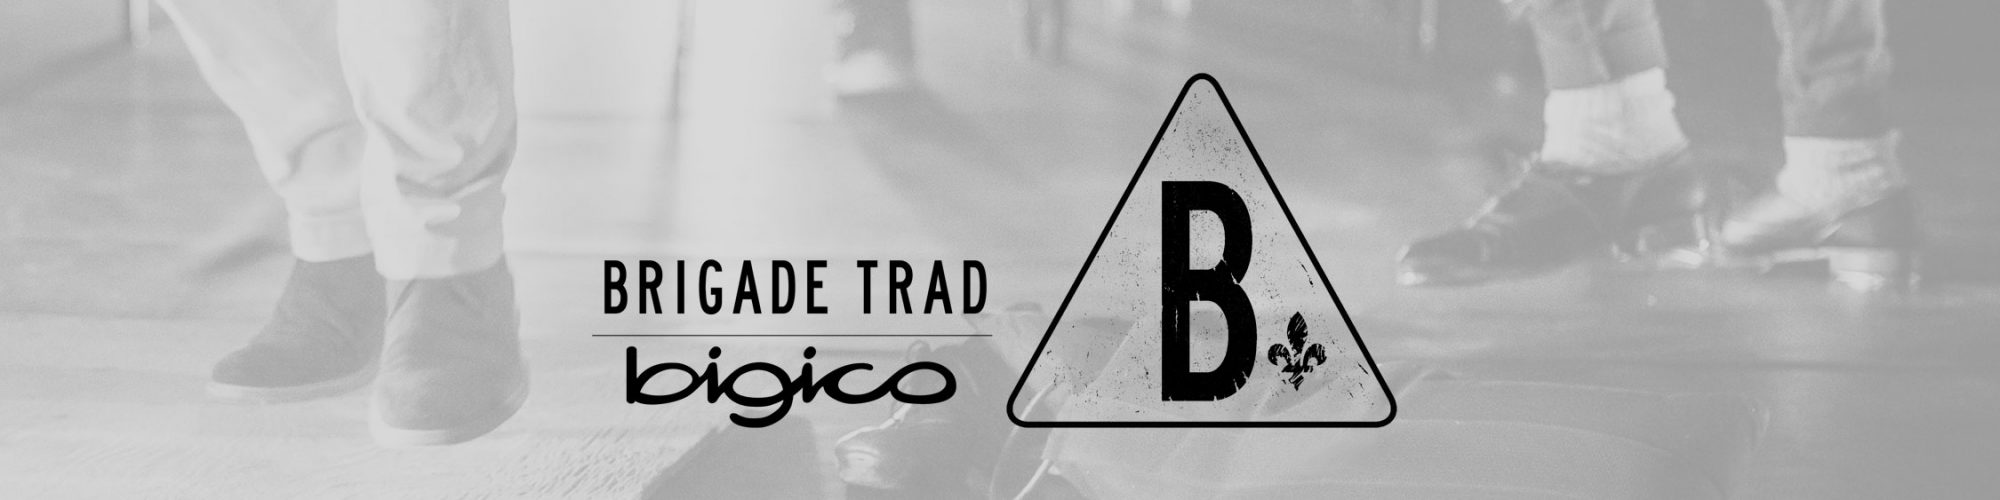 brigade-trad-slide